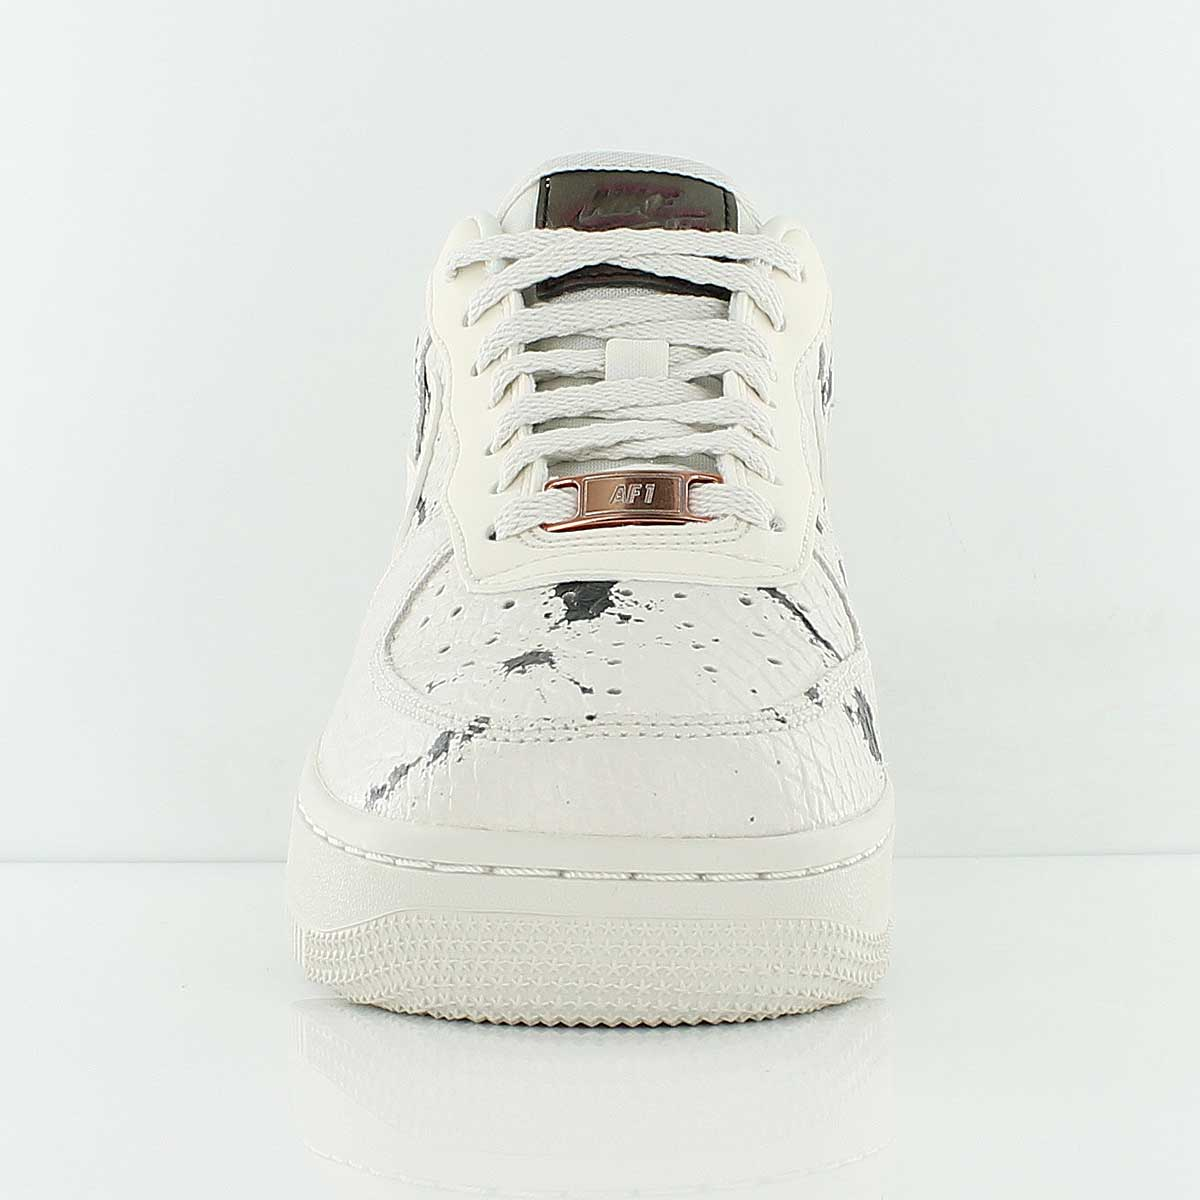 Nike Wmns Air Force 1 180 07 Lx Phantom Dead Stock Sneakerblog